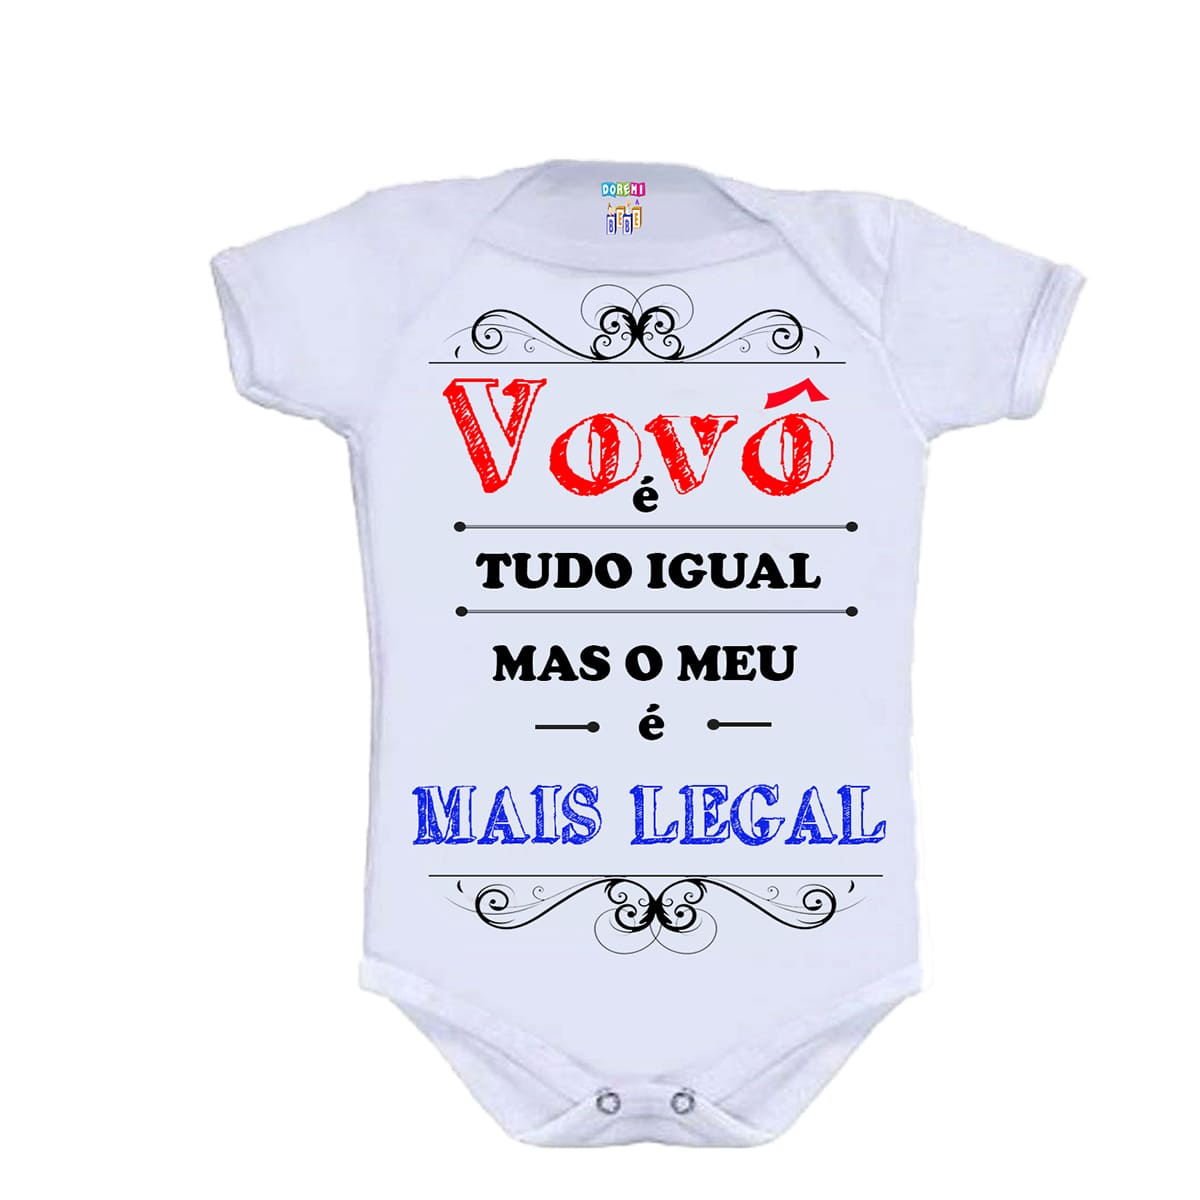 Body Personalizado M/C Vovô + Legal - Do Re Mi Bebê